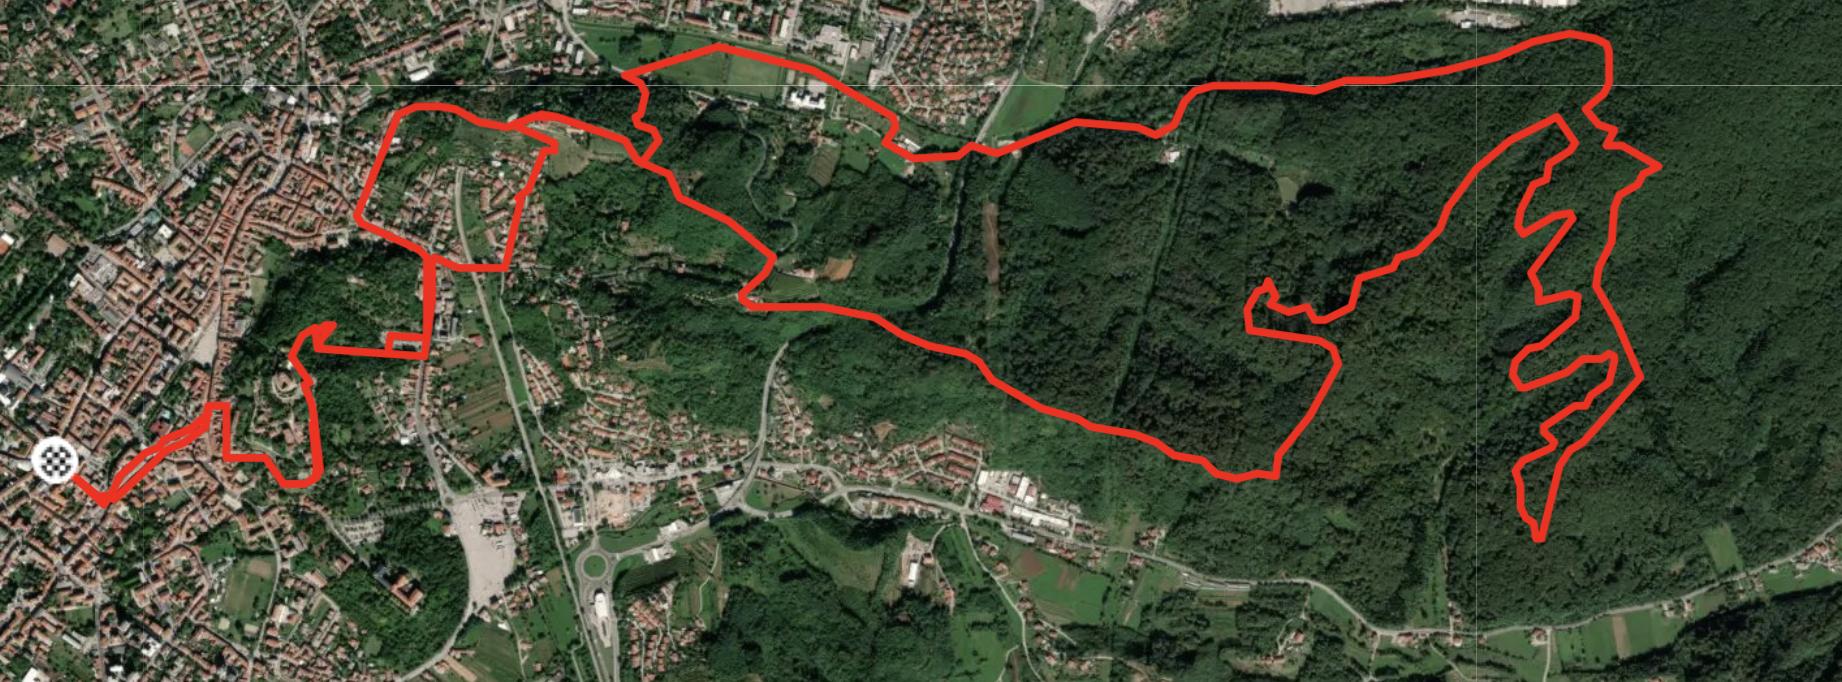 http://www.bikeandrungorizia.it/wp-content/uploads/2021/04/TDC21-PERCORSO.png